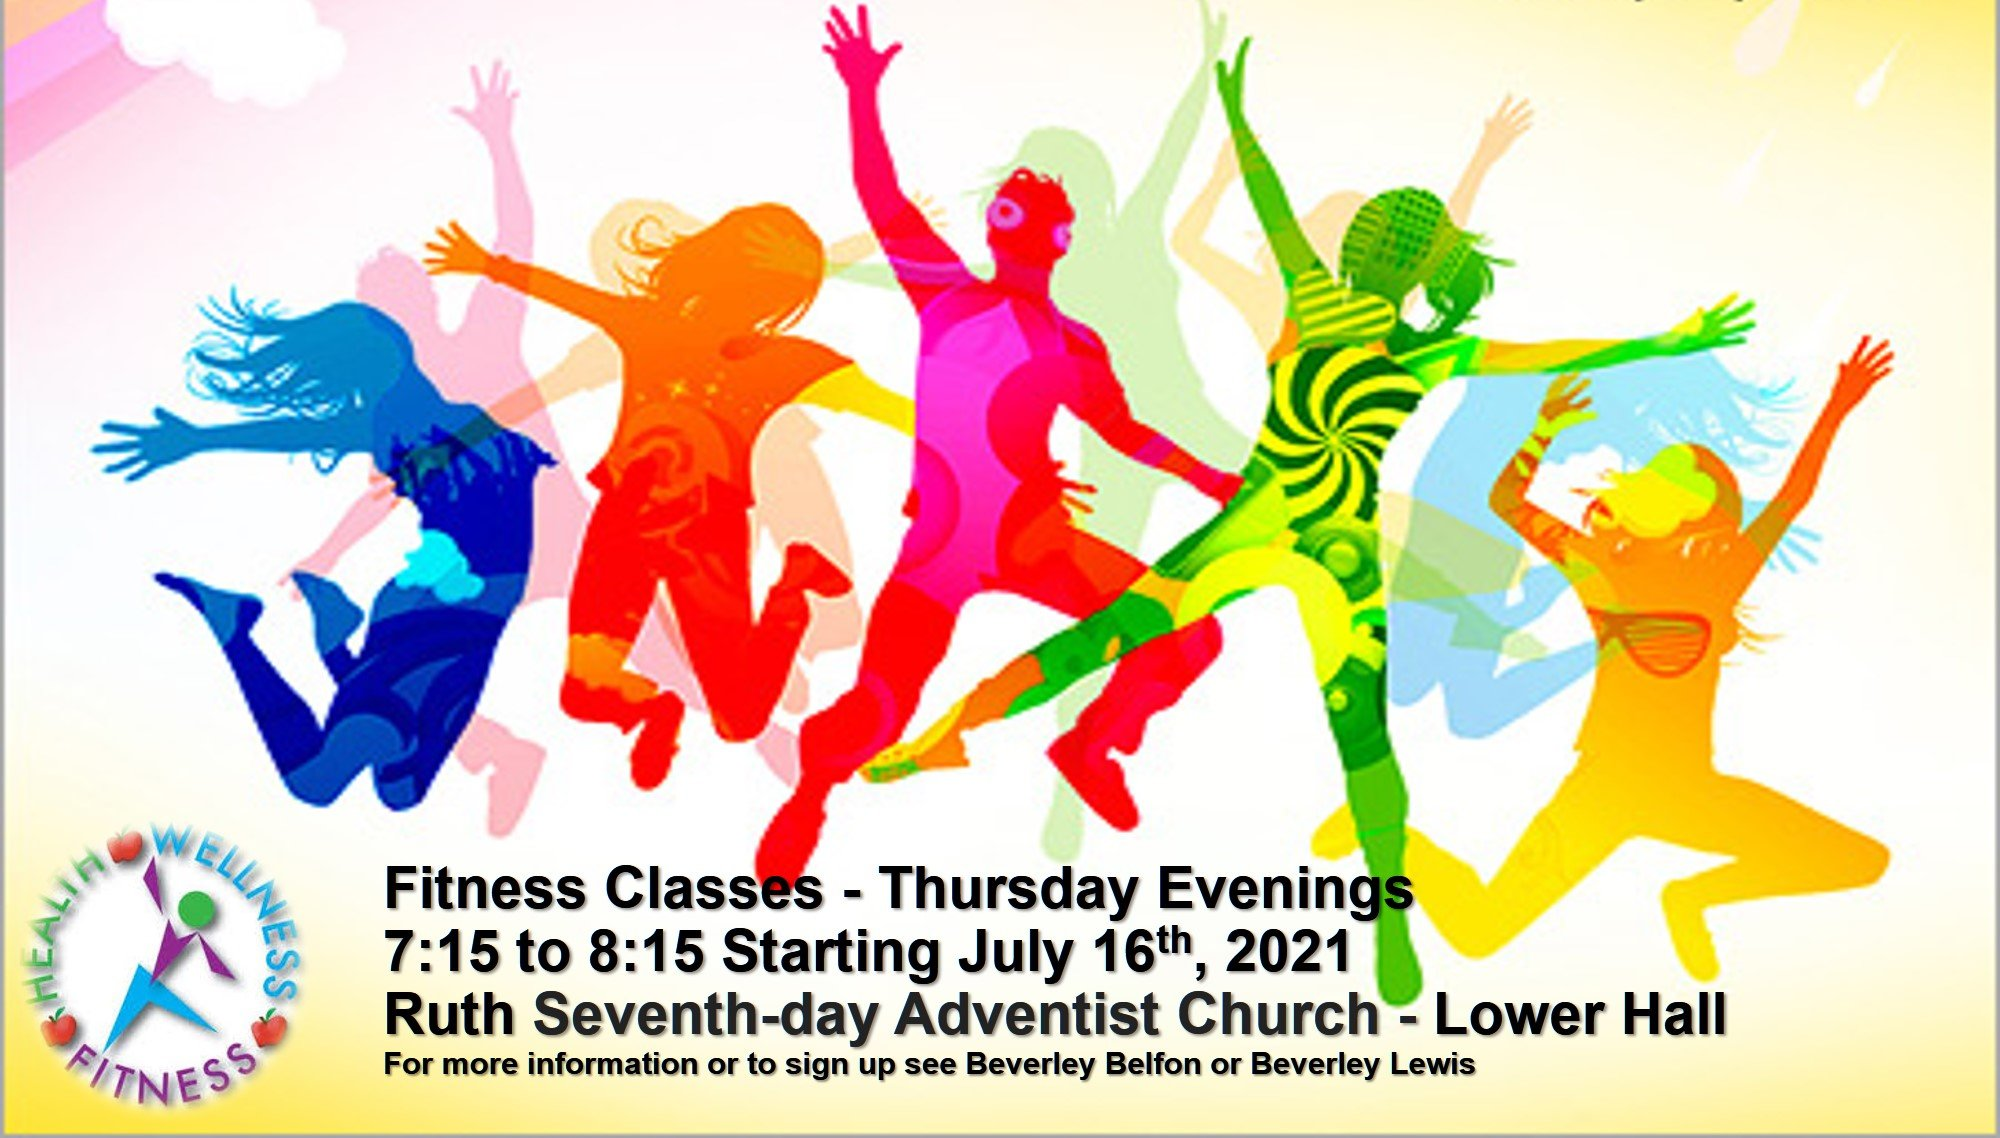 Fitness Classes RuthSDA flyer